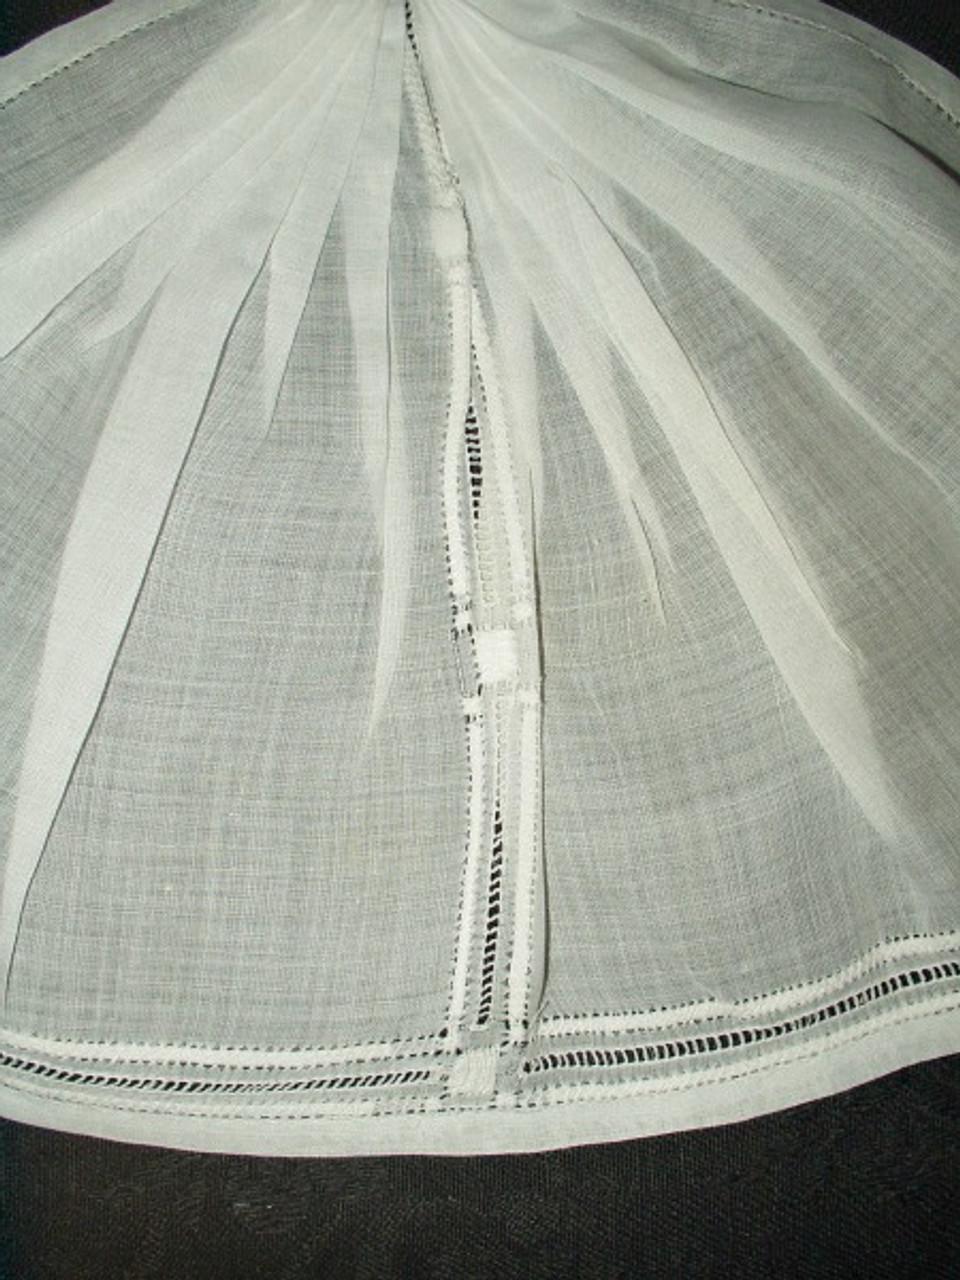 Antique Victorian Edwardian Drawn and Hemstitched White Batiste Jabot Collar